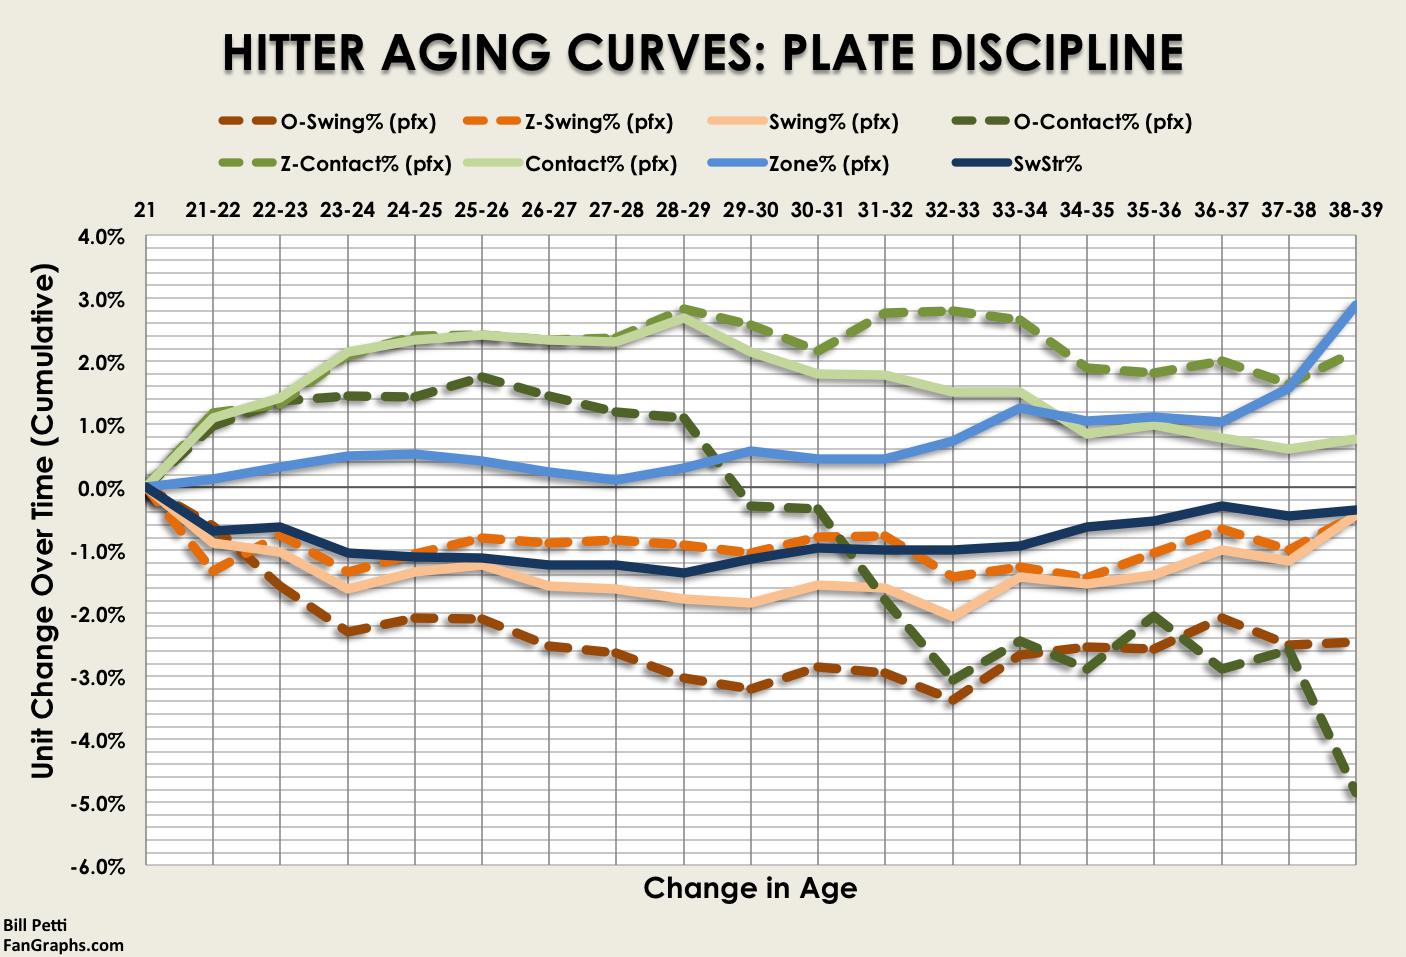 AgingCurves_Hitters_Discipline_All (1)